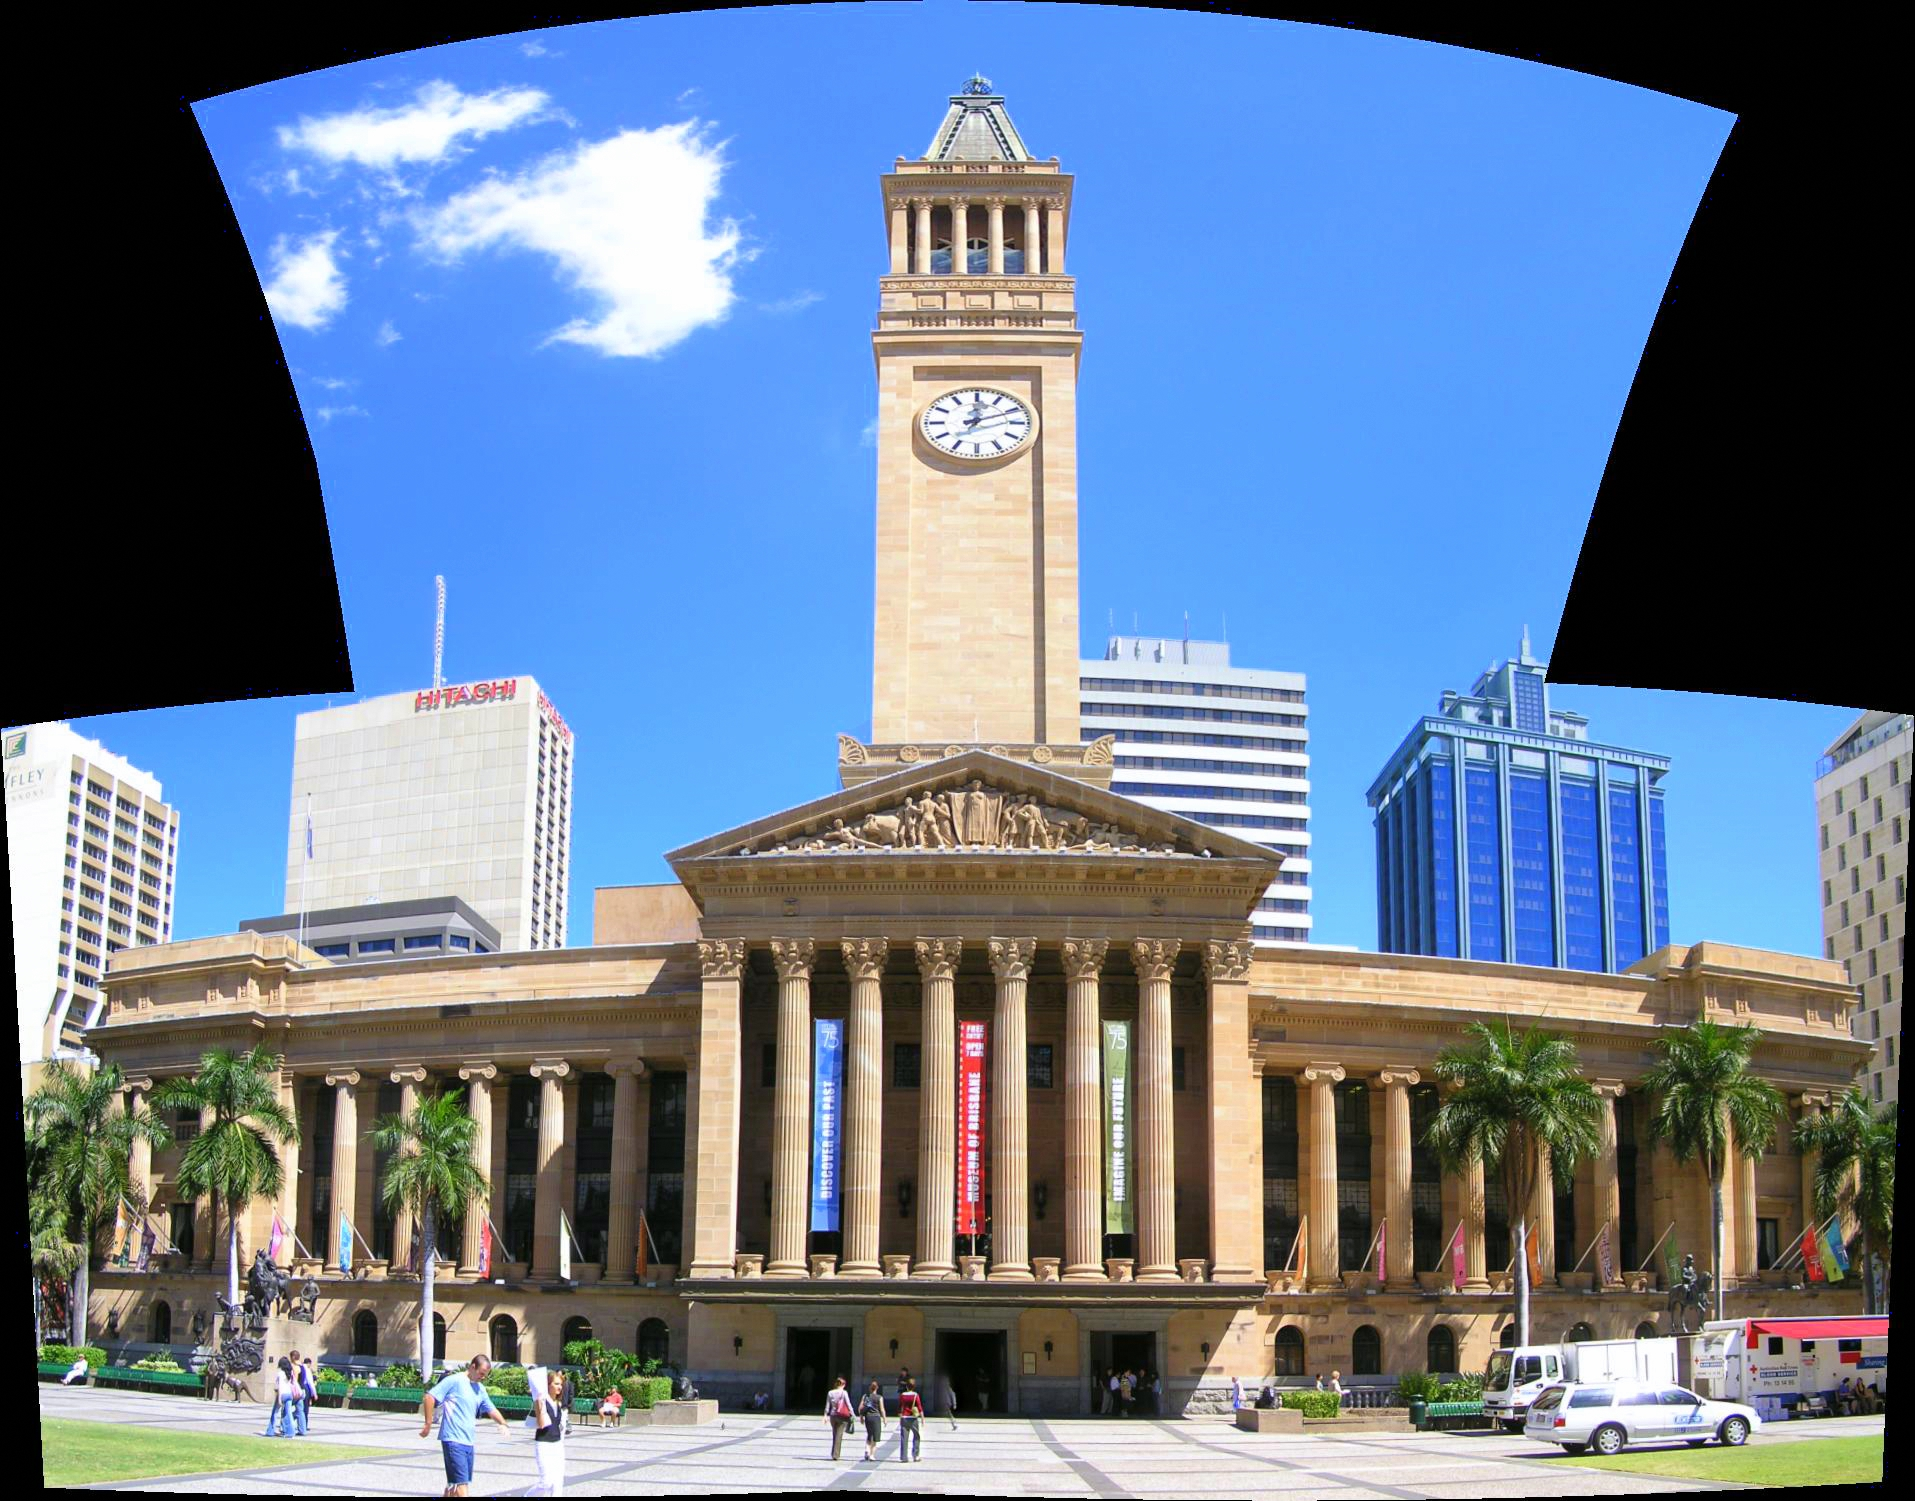 Uf preview dates in Brisbane